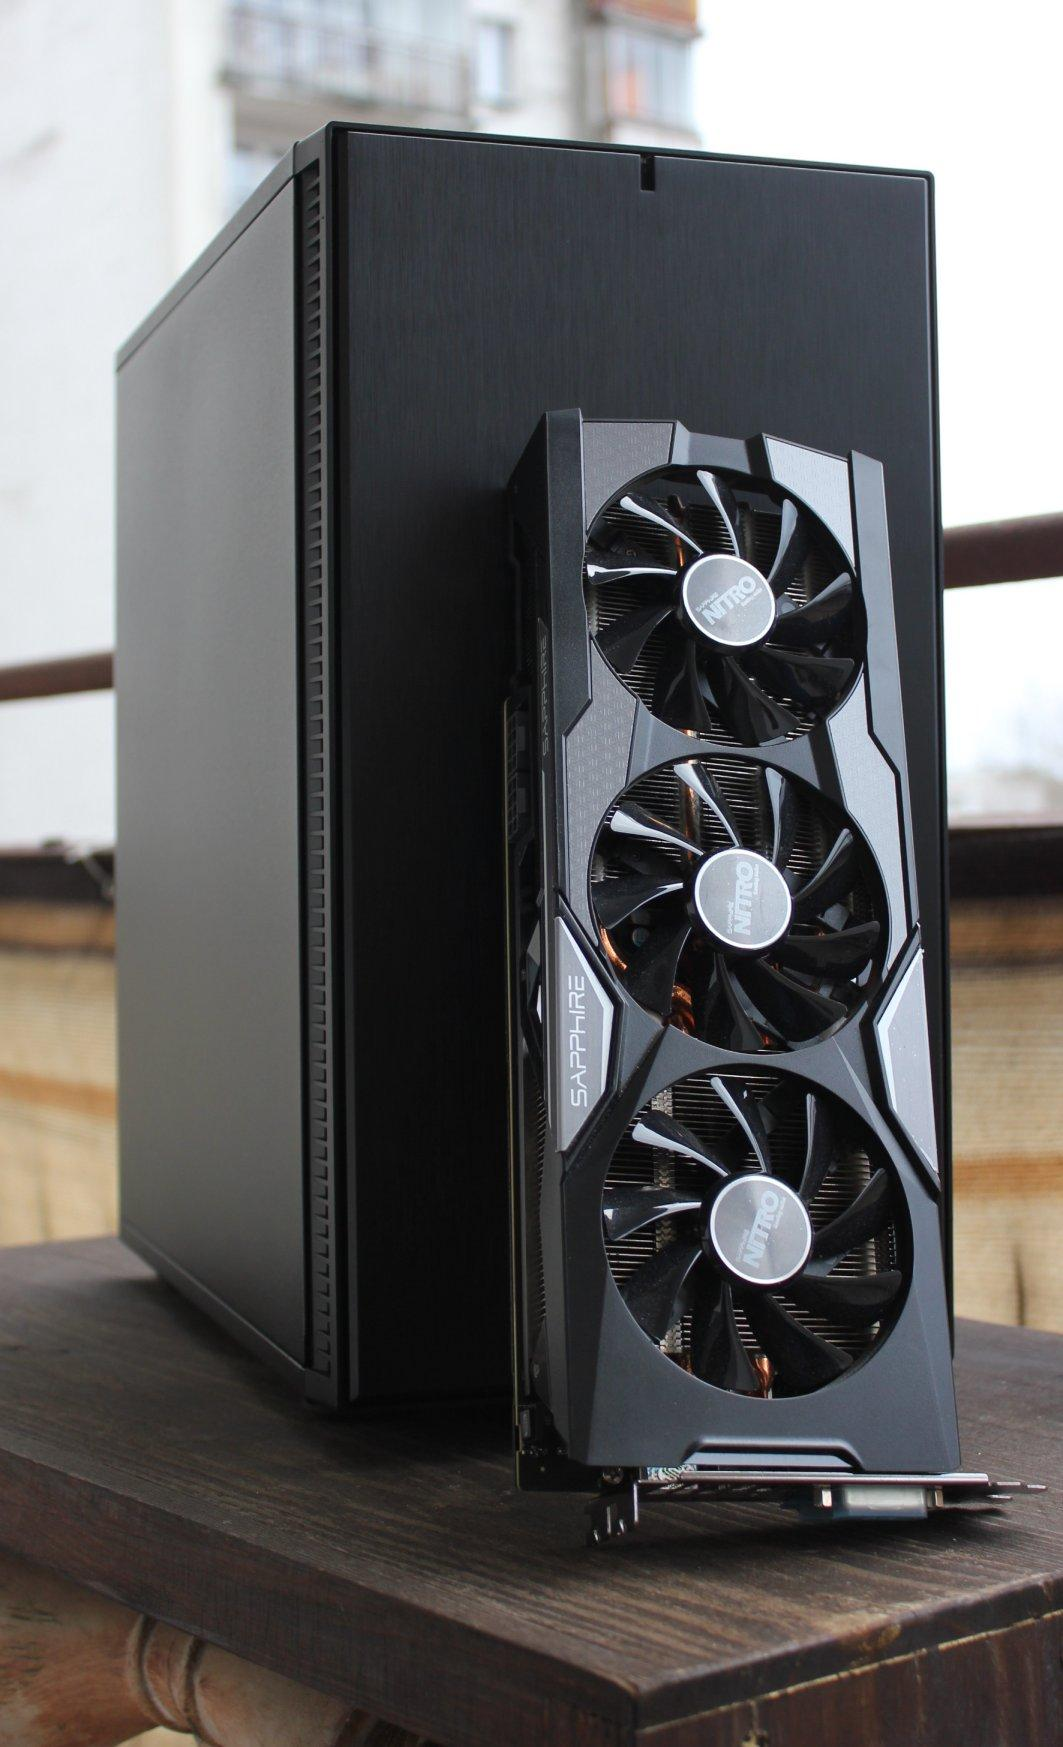 RkBlog :: Threadripper 1920X and Vega 64 all water AiO build